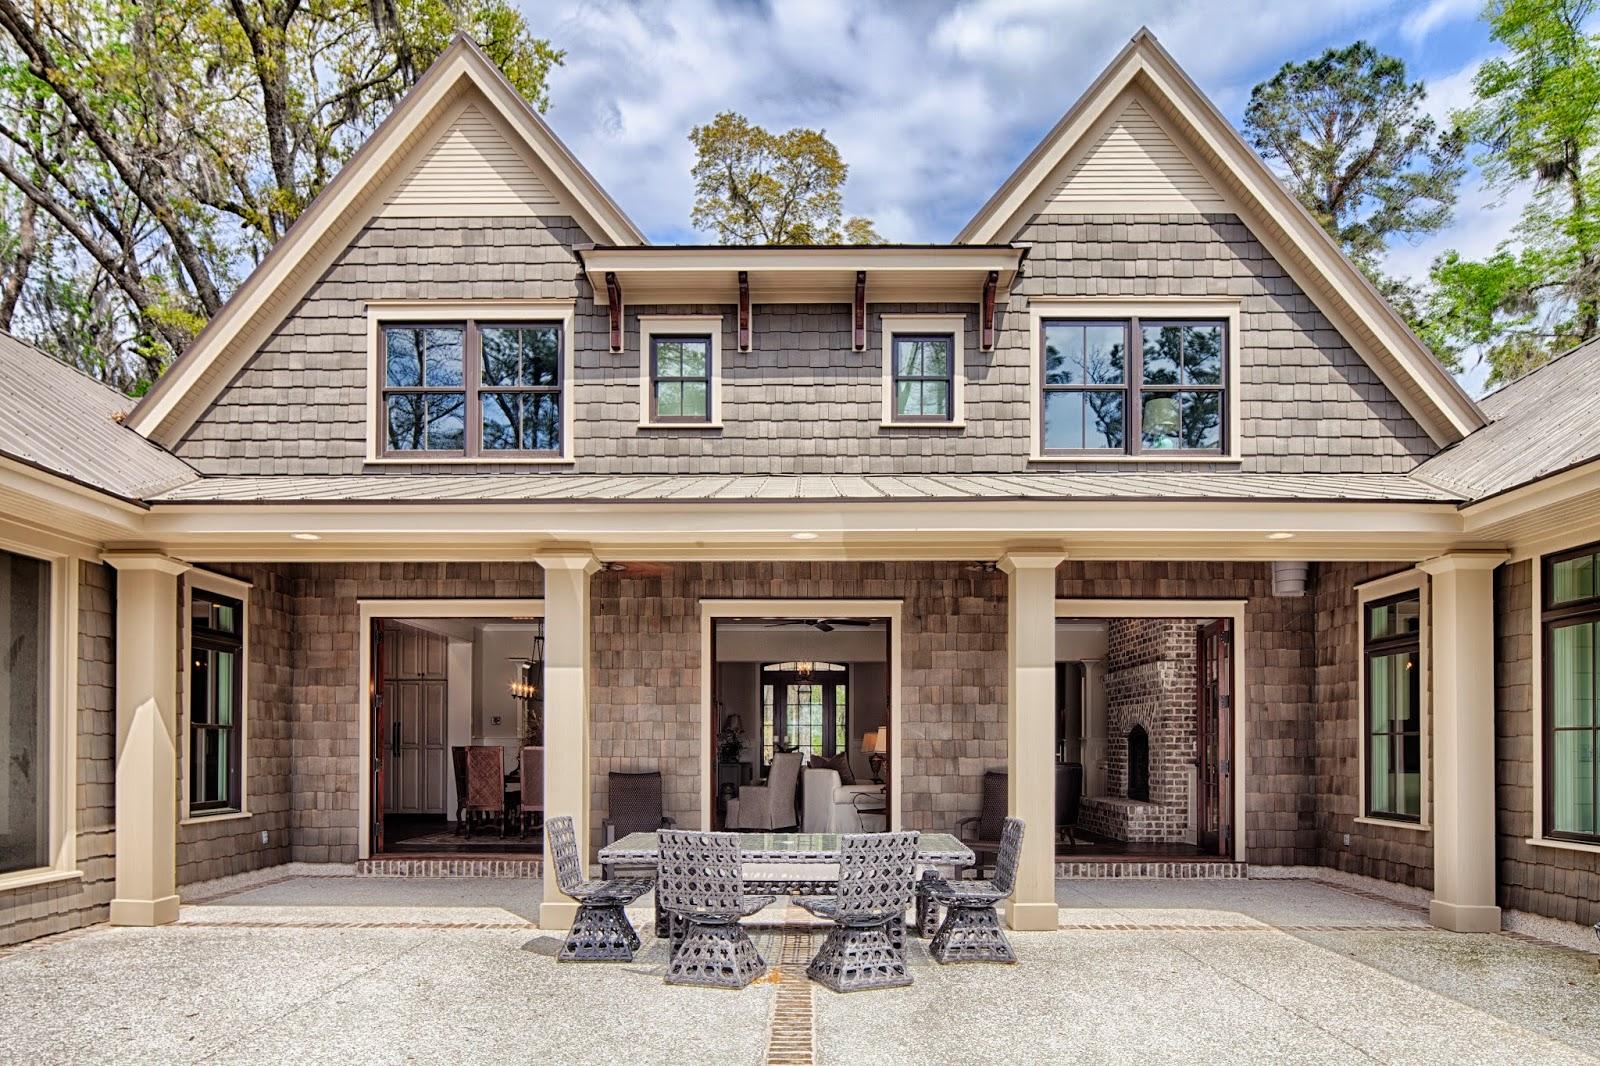 Georgetown Visbeen Architects - Featured designer visbeen associates